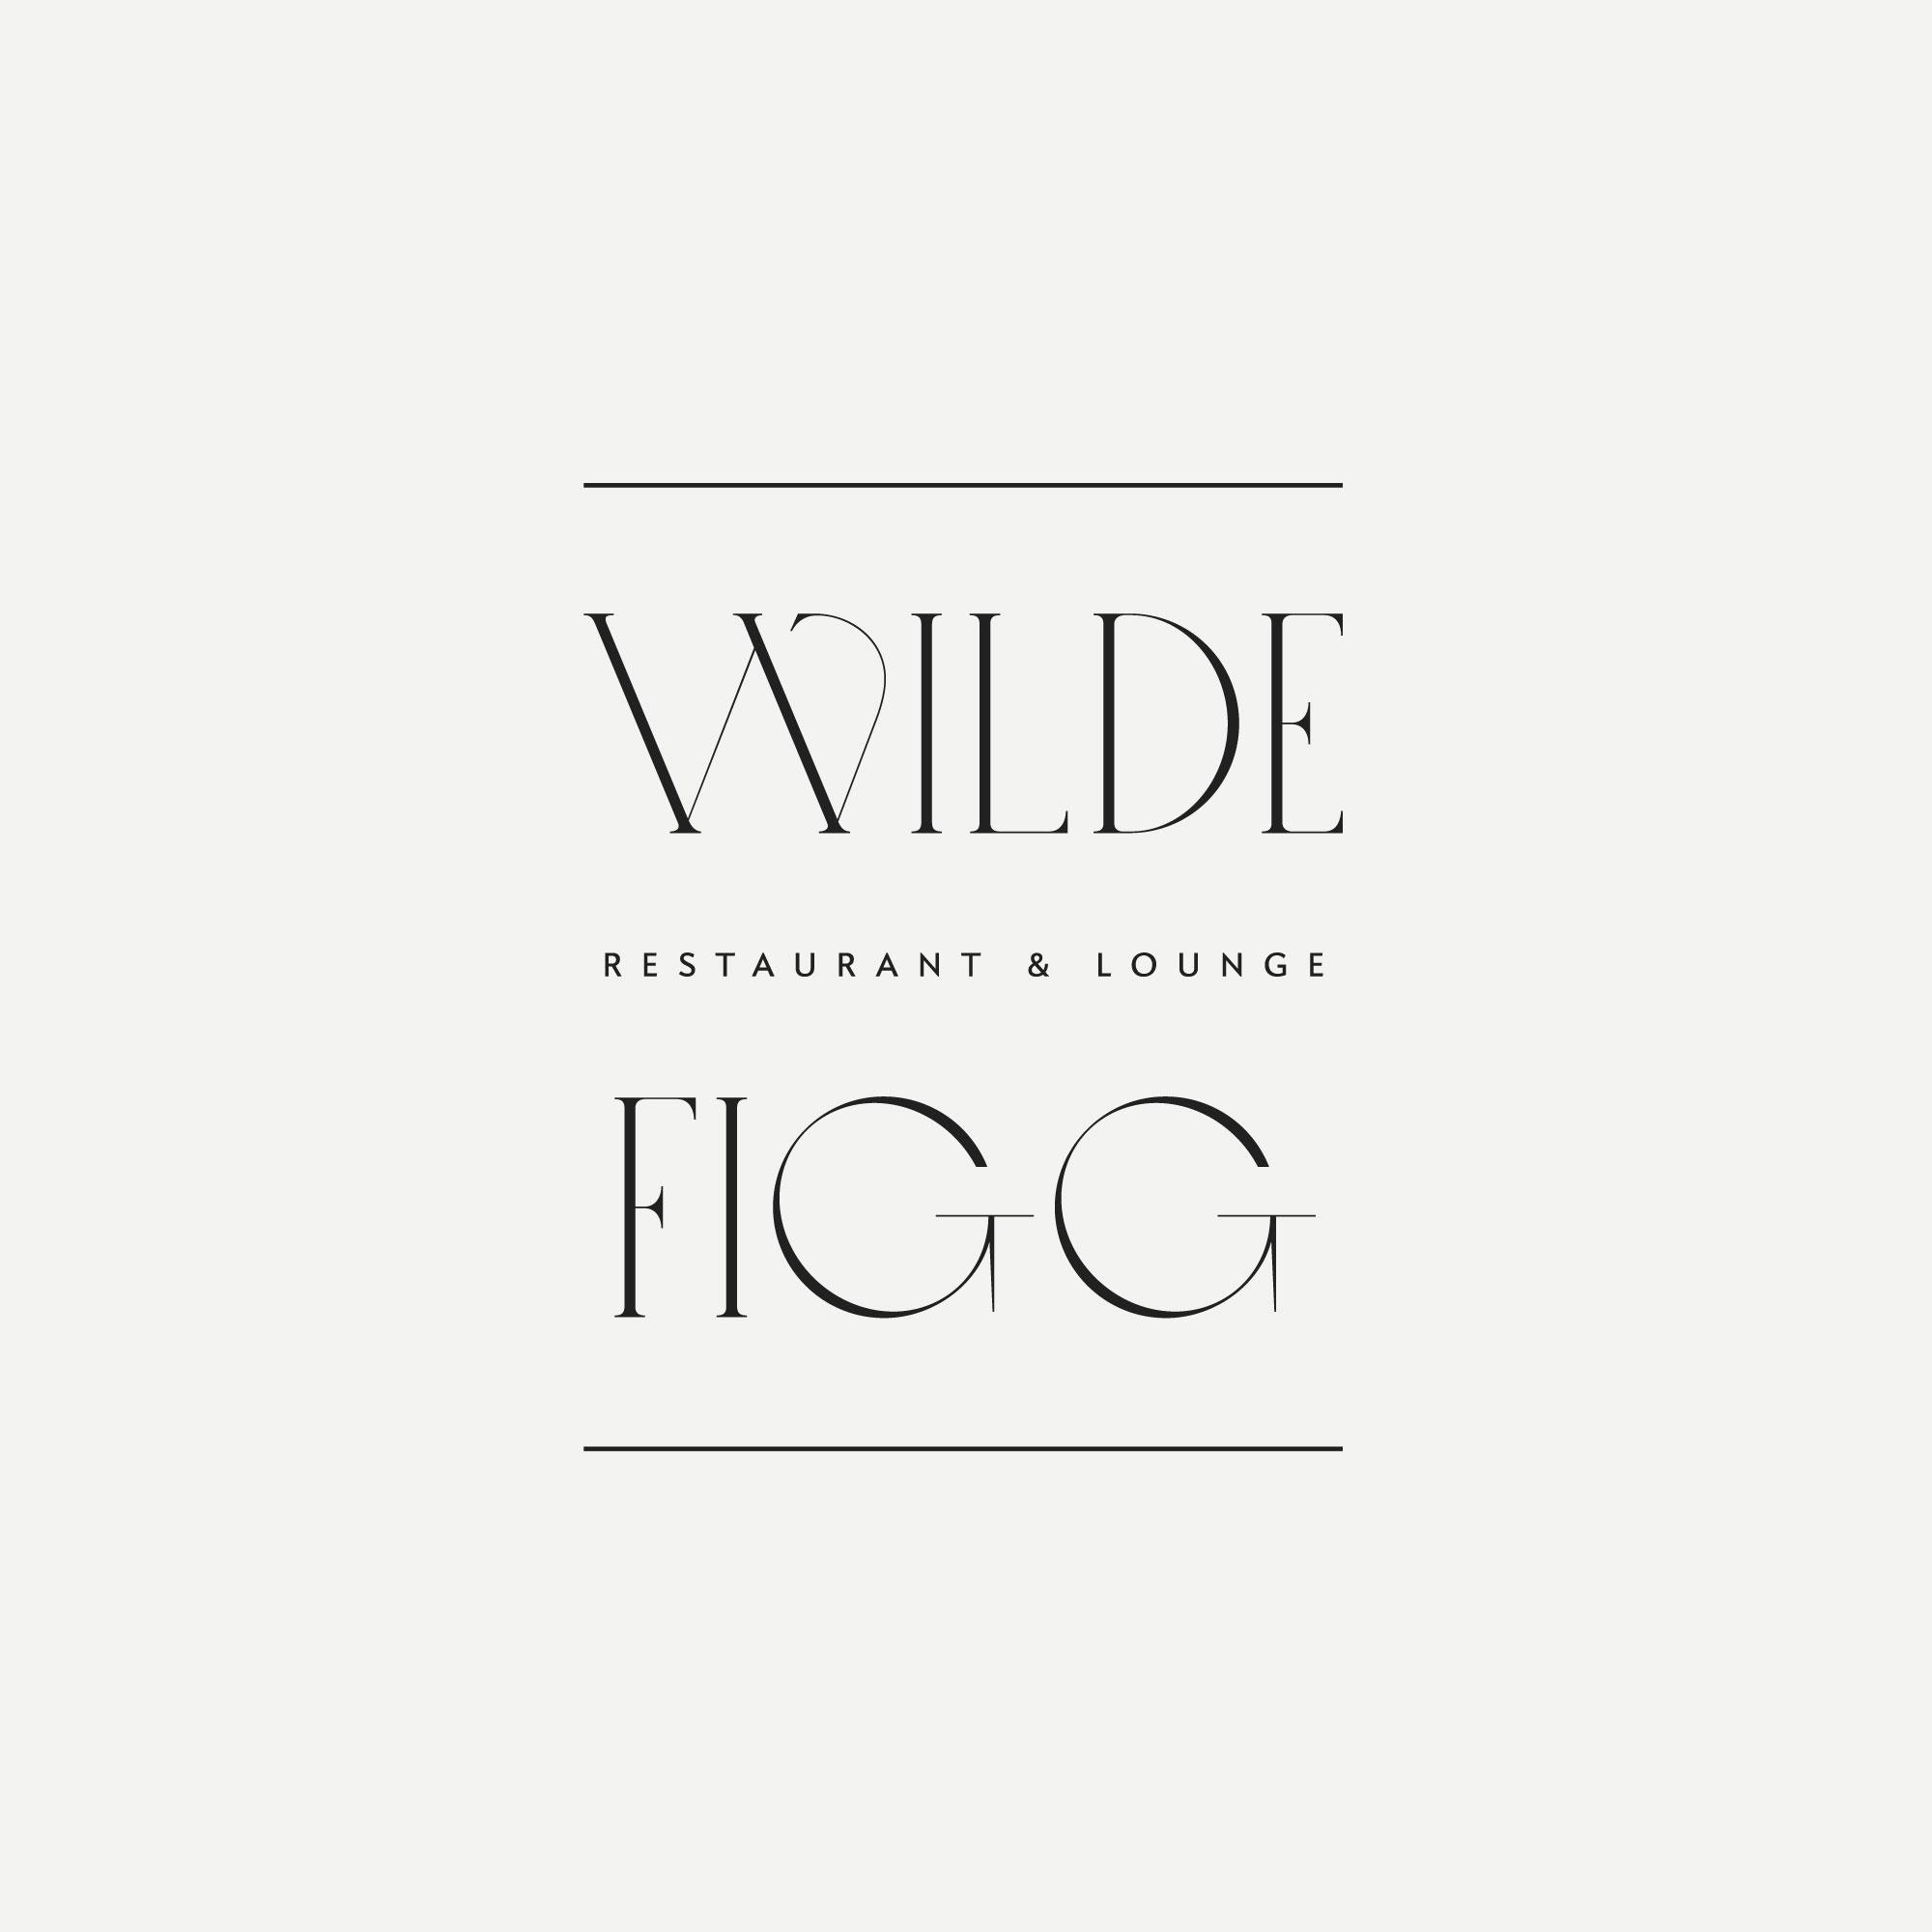 winnipeg-branding-design-logo-italian-restaurant-food-pasta-clover-and-crow